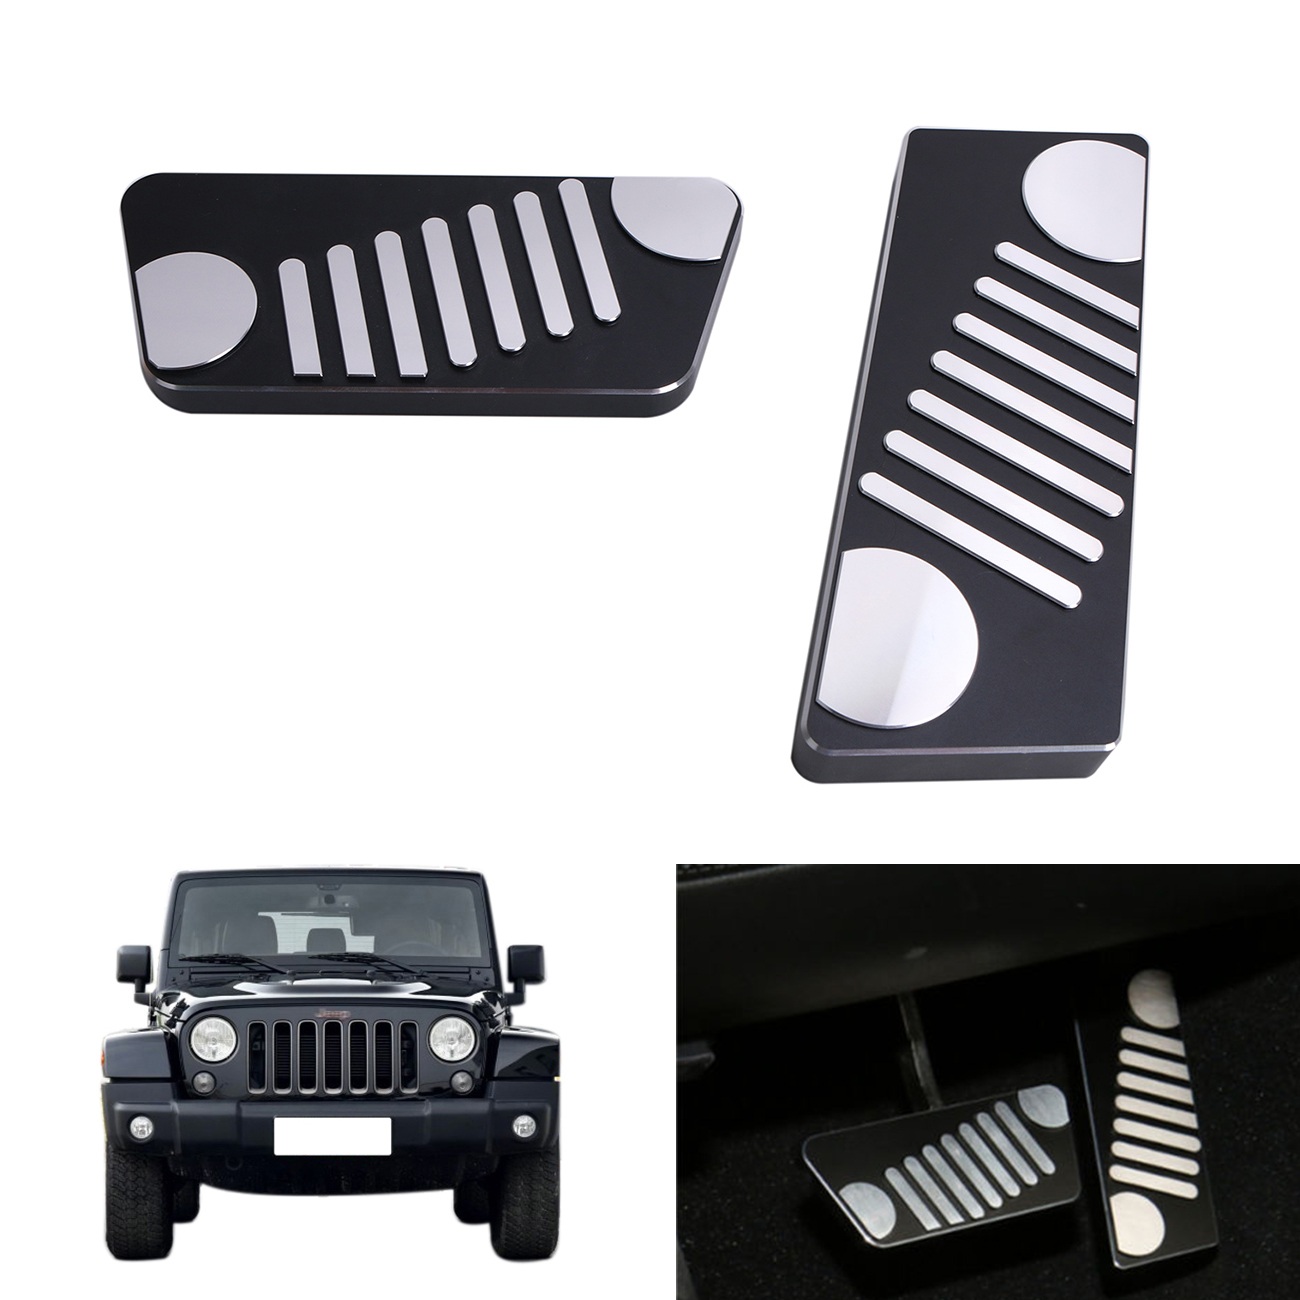 hight resolution of black aluminum alloy accelerator gas brake pedal kit for jeep wrangler jk rubicon sahara sport 2009 2016 left hand drive ce037